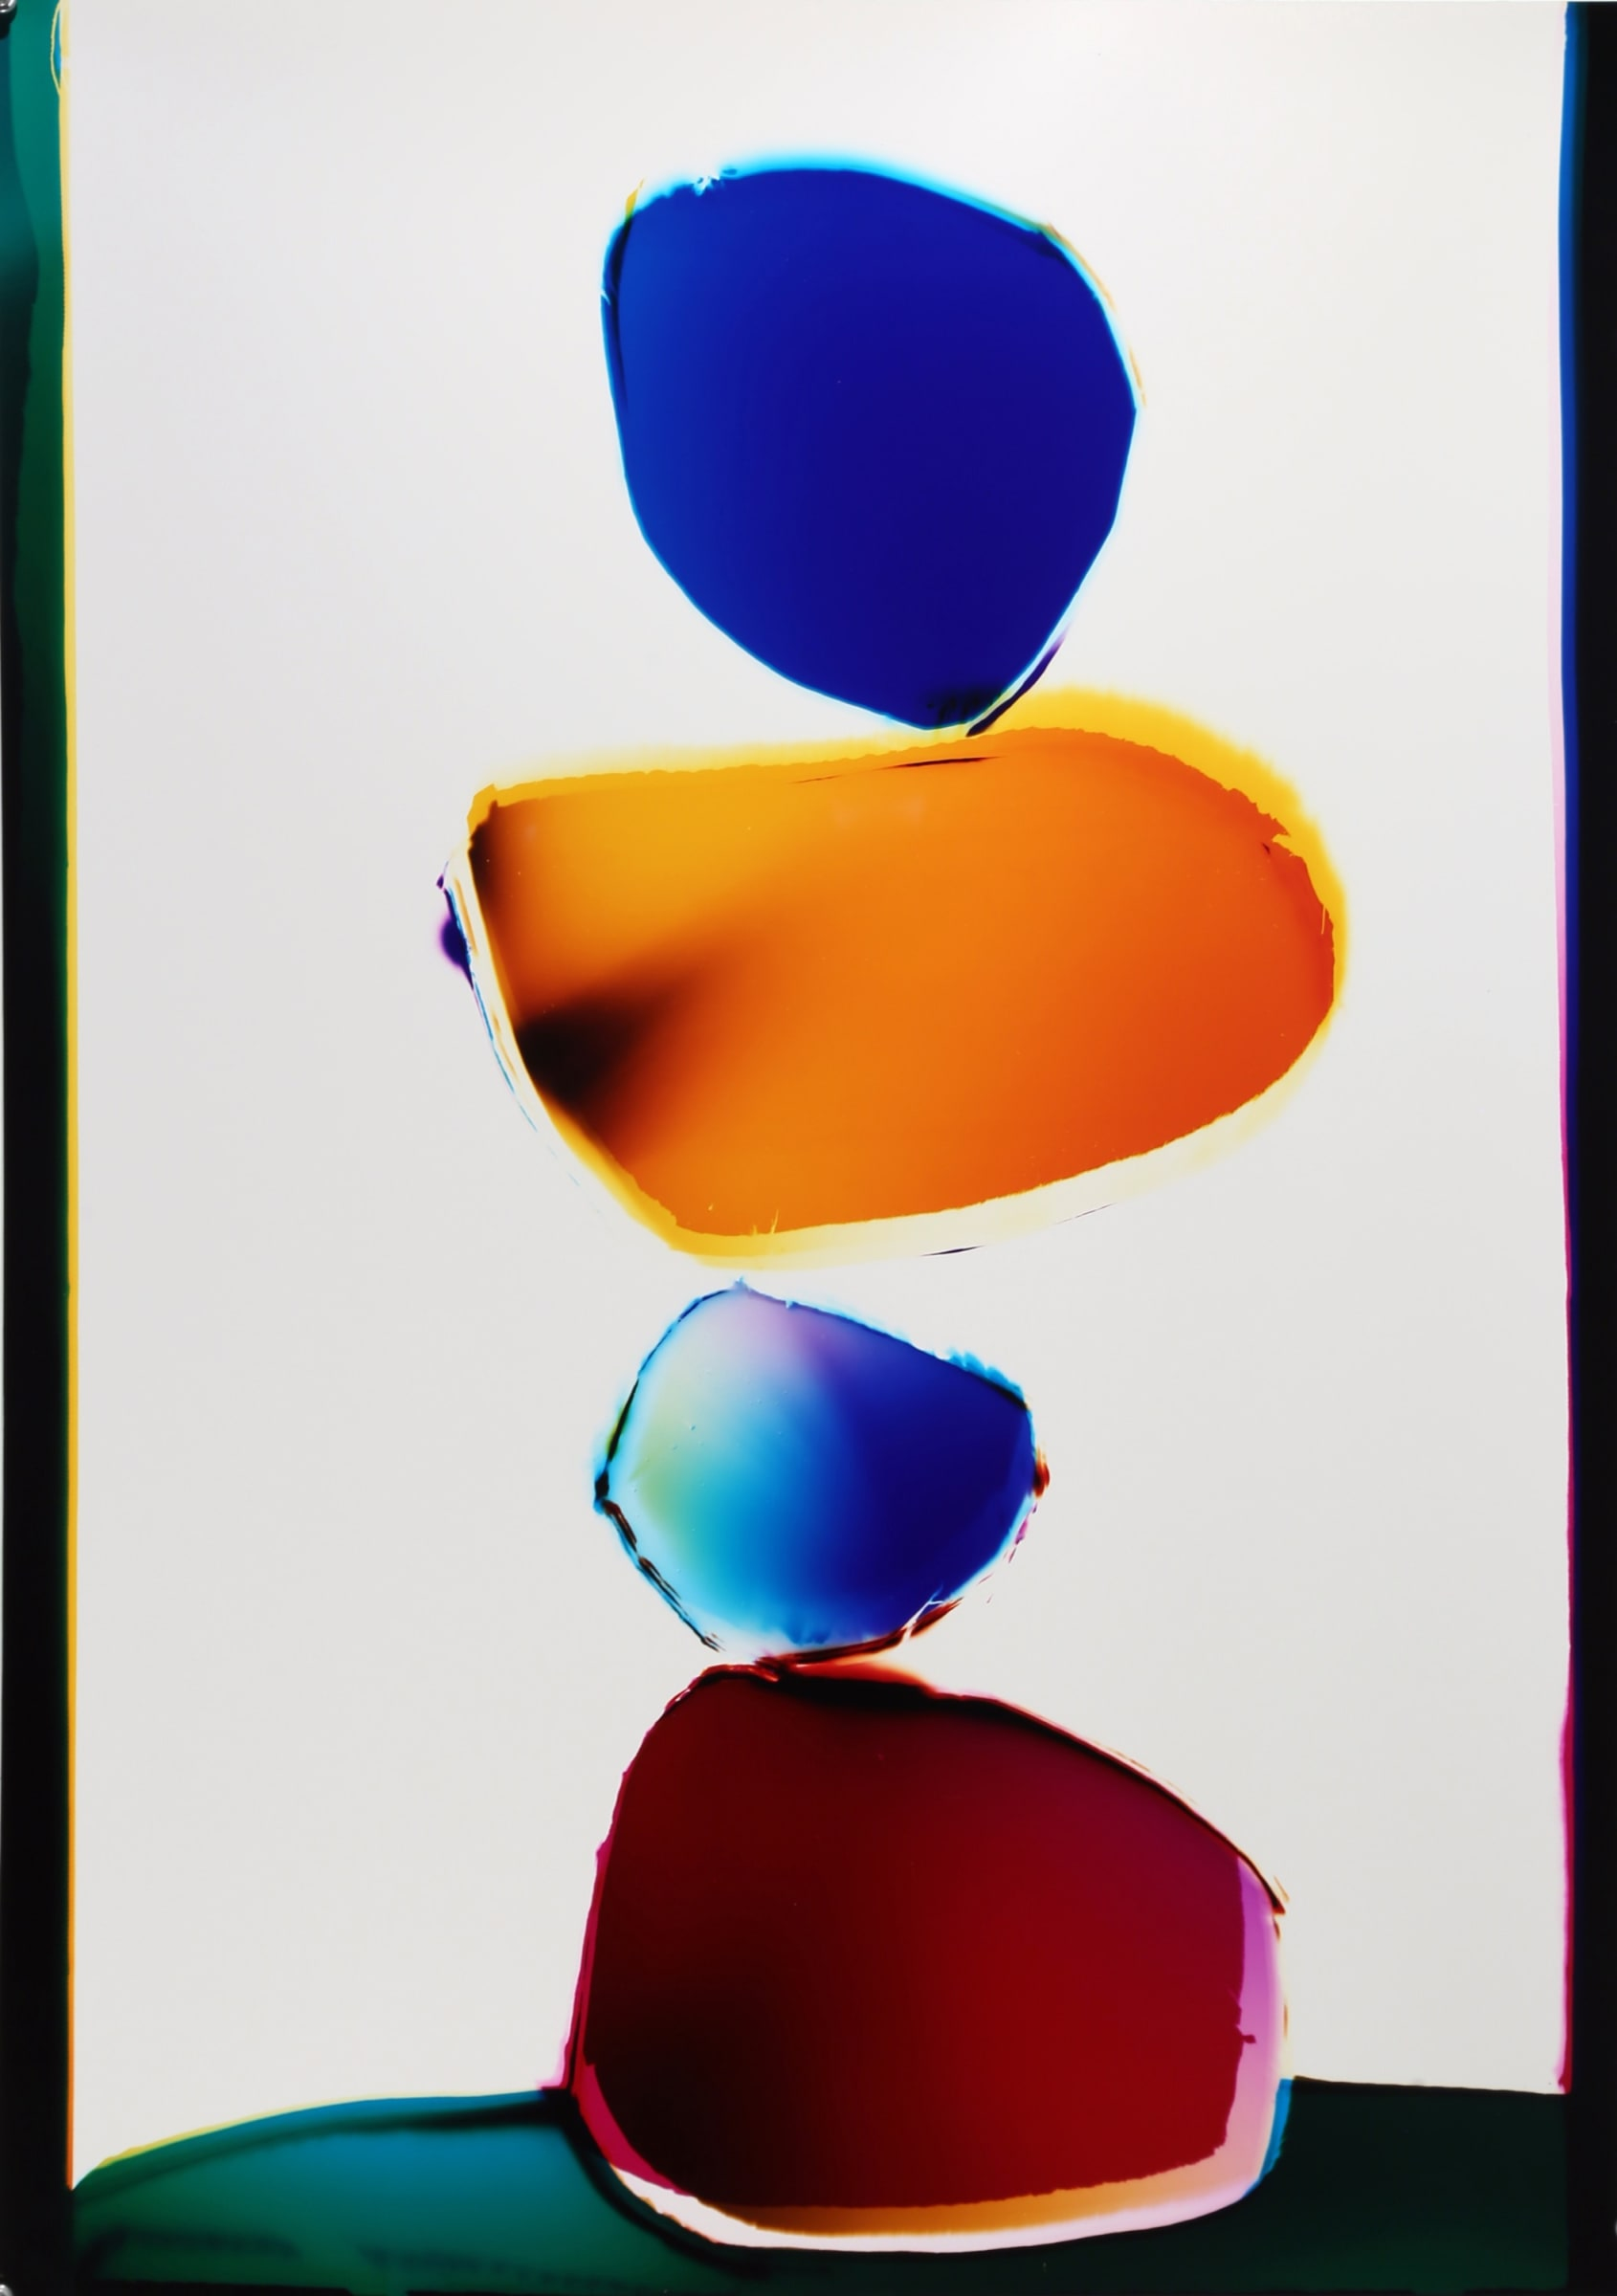 "<span class=""link fancybox-details-link""><a href=""/exhibitions/11/works/artworks126/"">View Detail Page</a></span><div class=""artist""><strong>Liz Nielsen</strong></div><div class=""title""><em>Mirror Stones</em>, 2018</div><div class=""signed_and_dated"">Signed, titled and dated on artist's label</div><div class=""medium"">Analogue Chromogenic Photogram on Fujiflex, Unique</div><div class=""dimensions"">75.9 x 52.9 cm<br>29 7/8 x 20 7/8 in</div>"